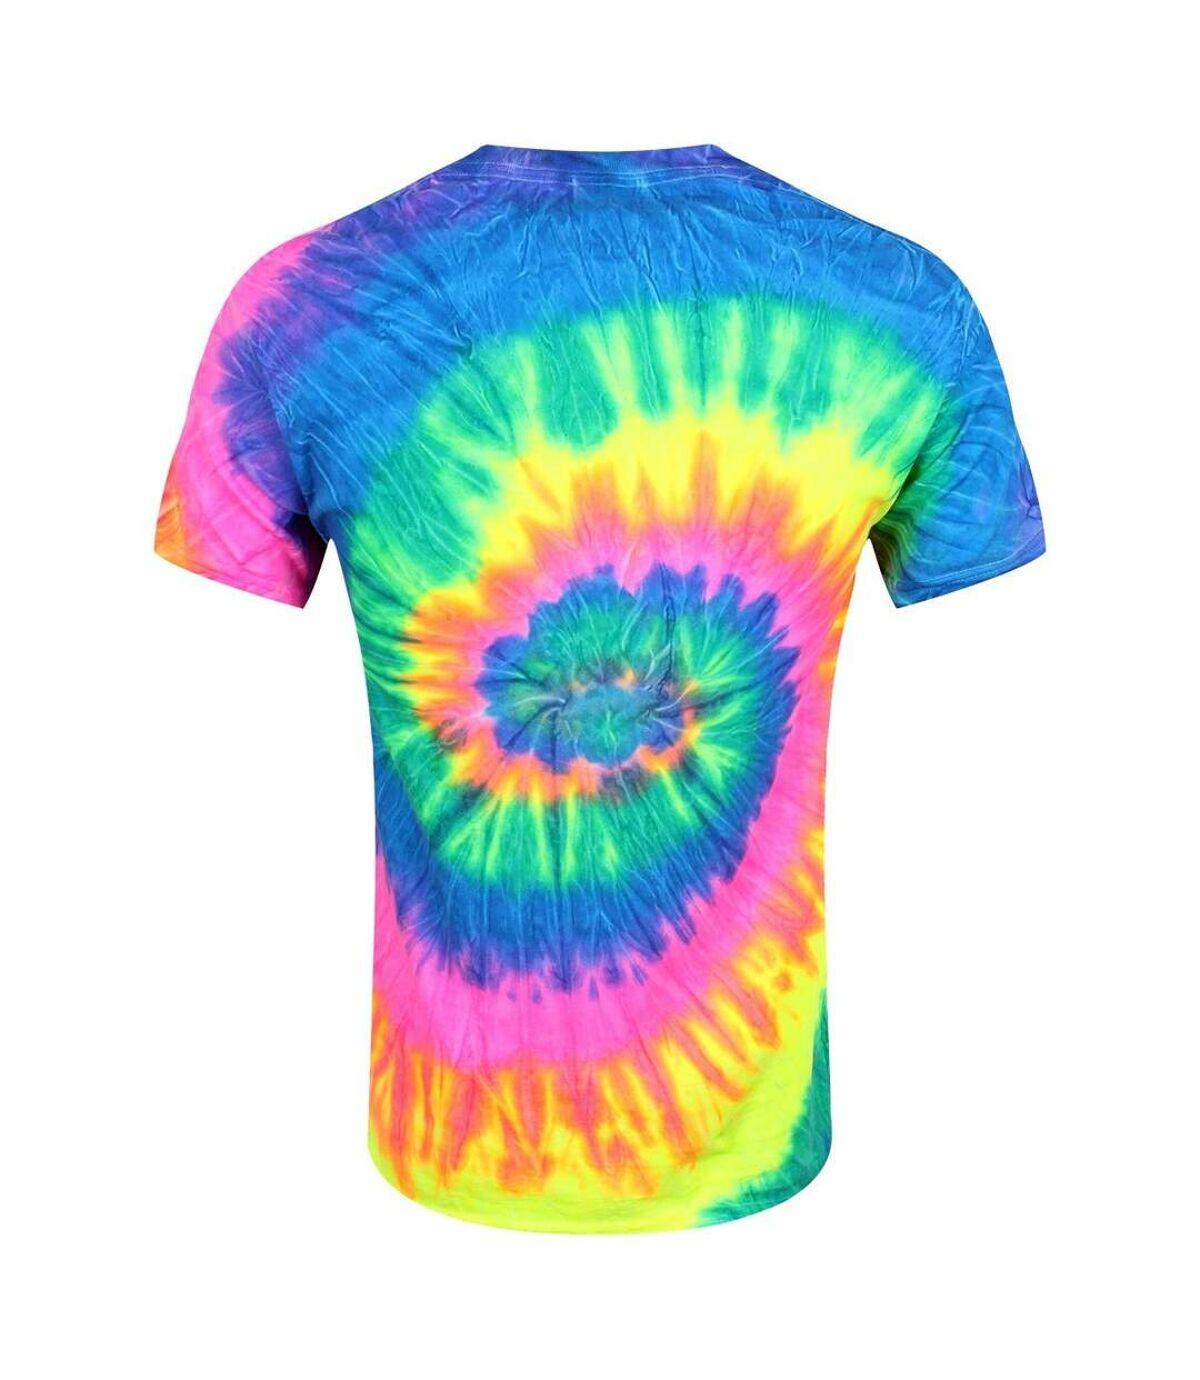 Unorthodox Collective Mens Chameleon T-Shirt (Multicoloured) - UTGR2930